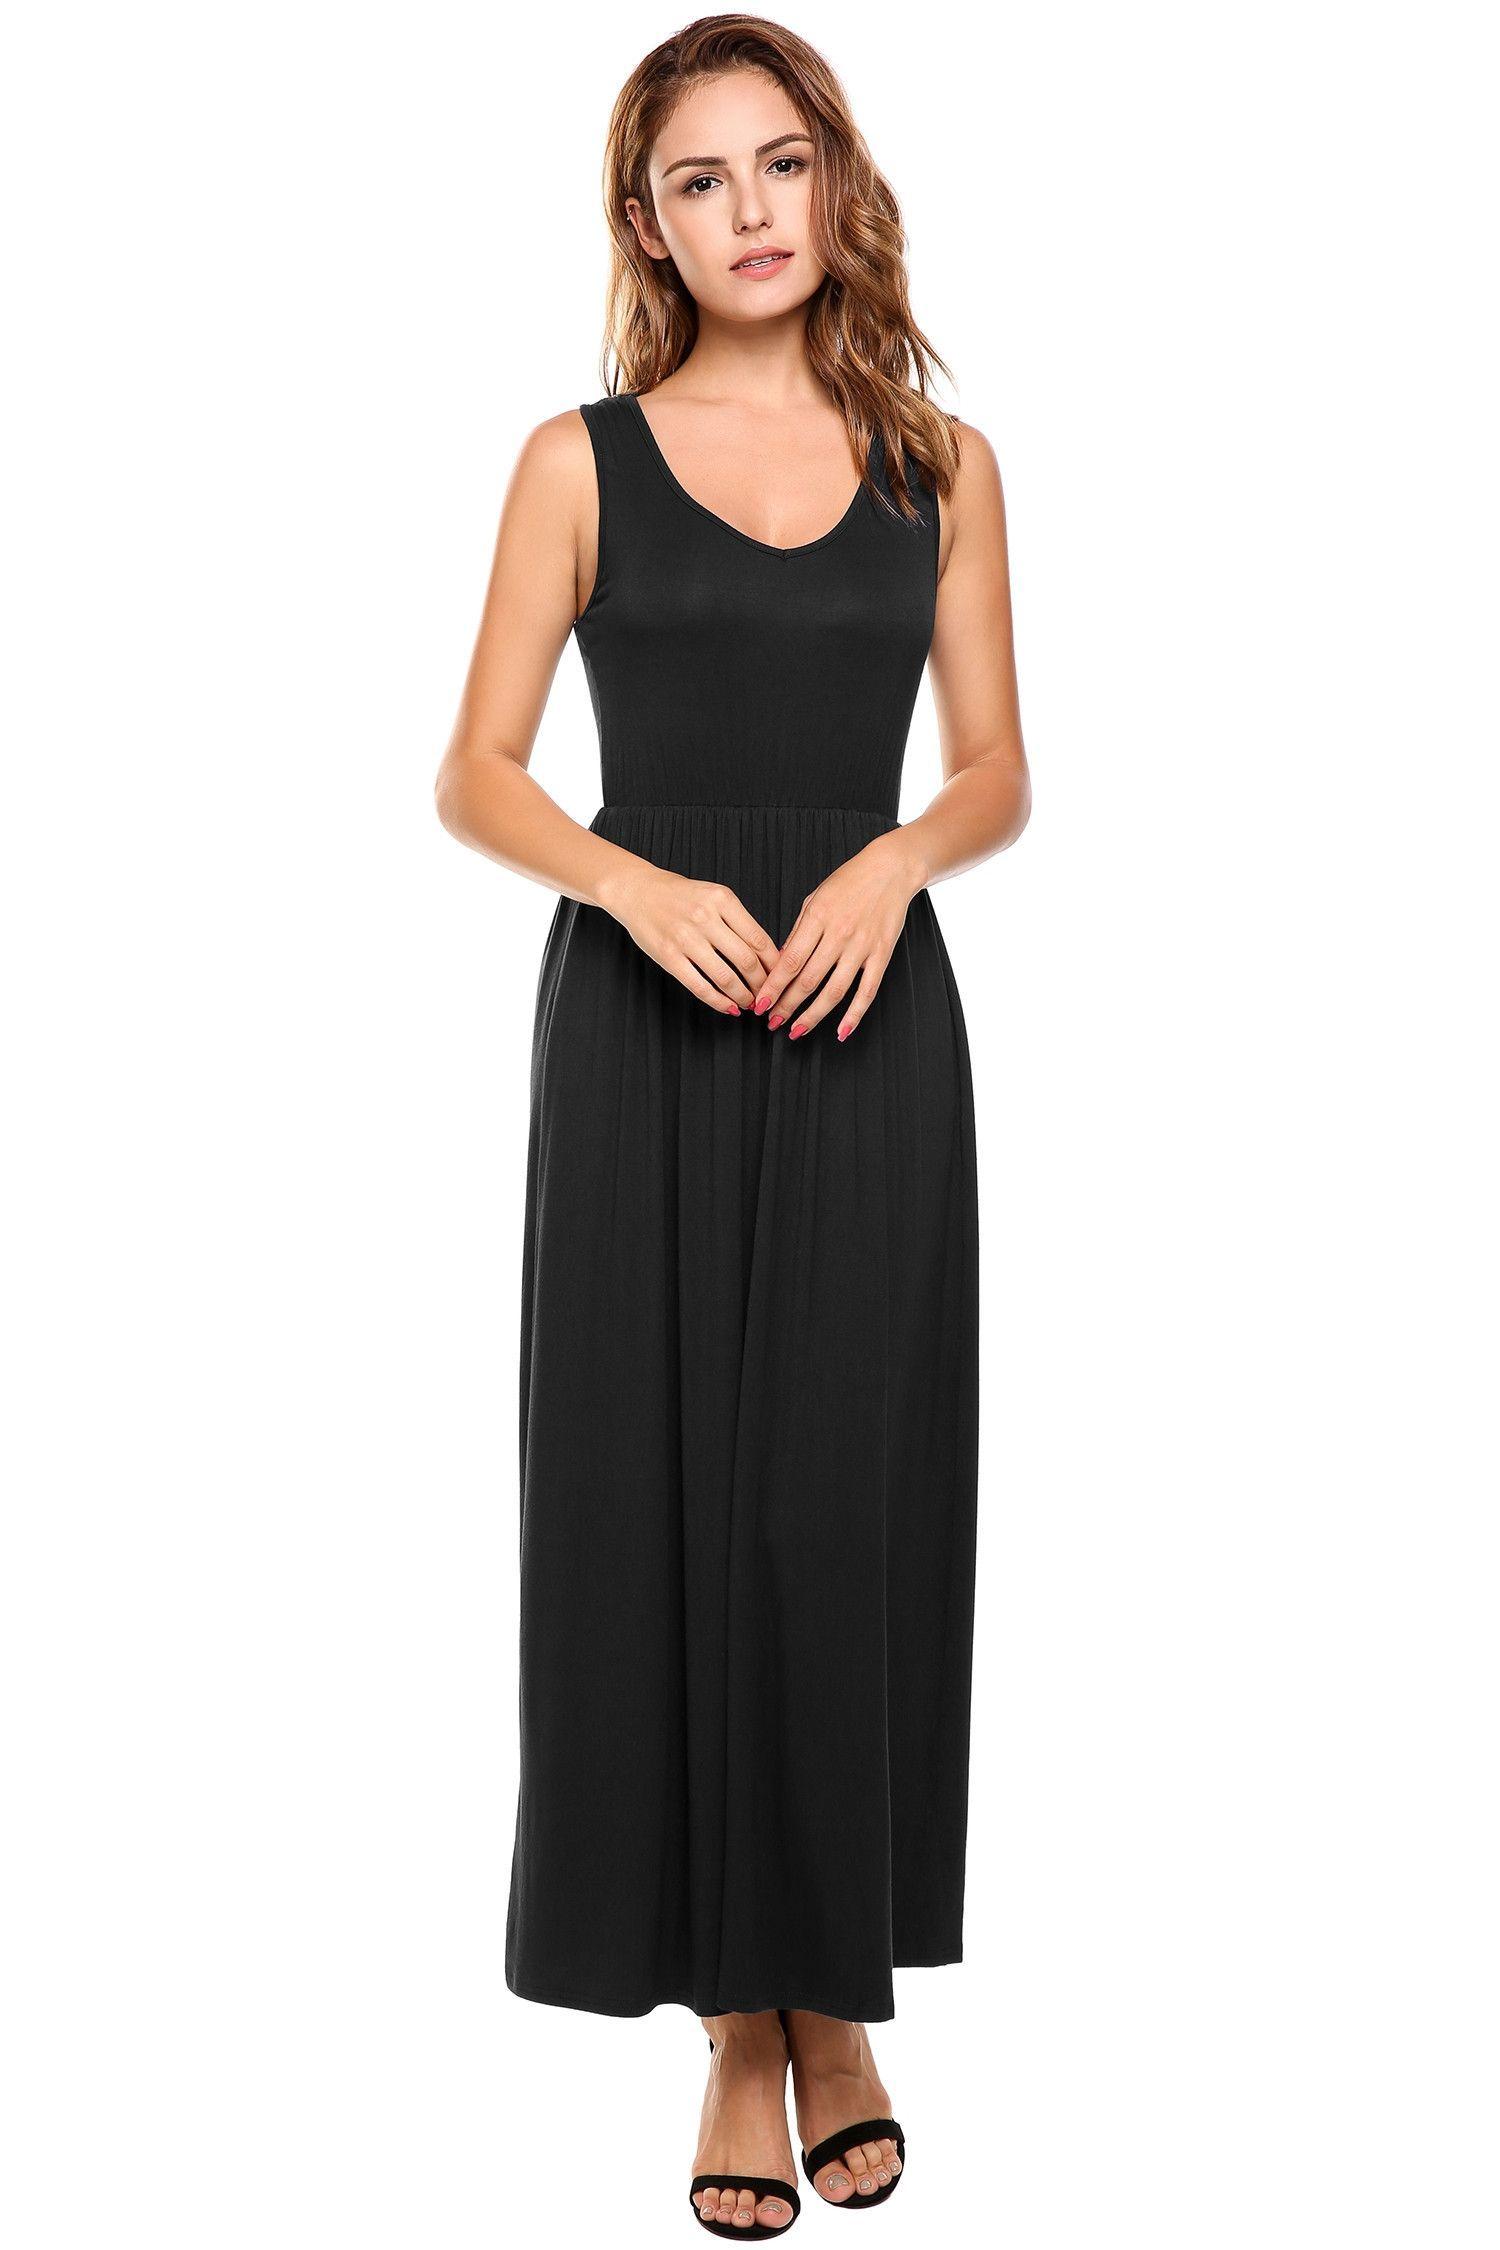 Black VNeck Sleeveless Elastic ALine Maxi Casual Dress